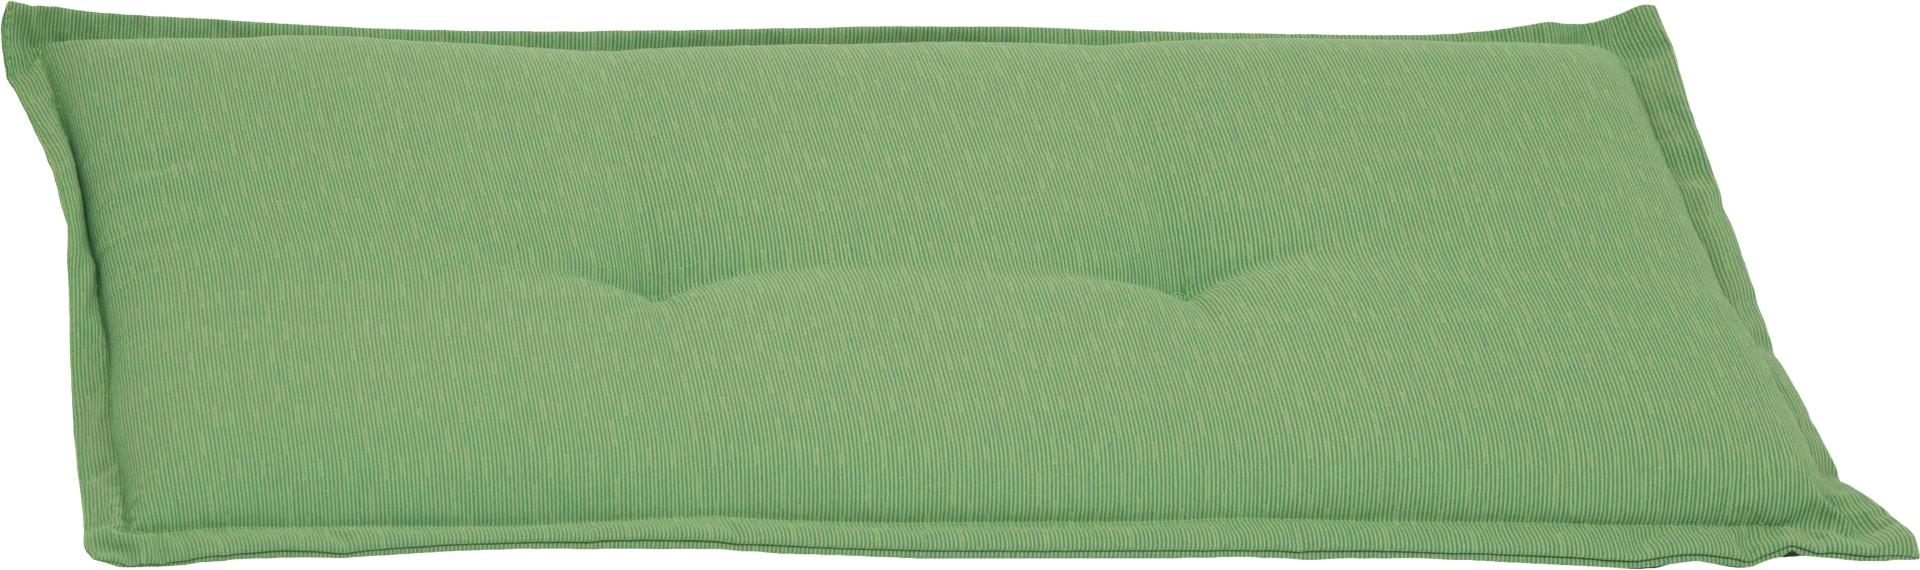 P211 Ascot Bankauflage 100/45 h.grün